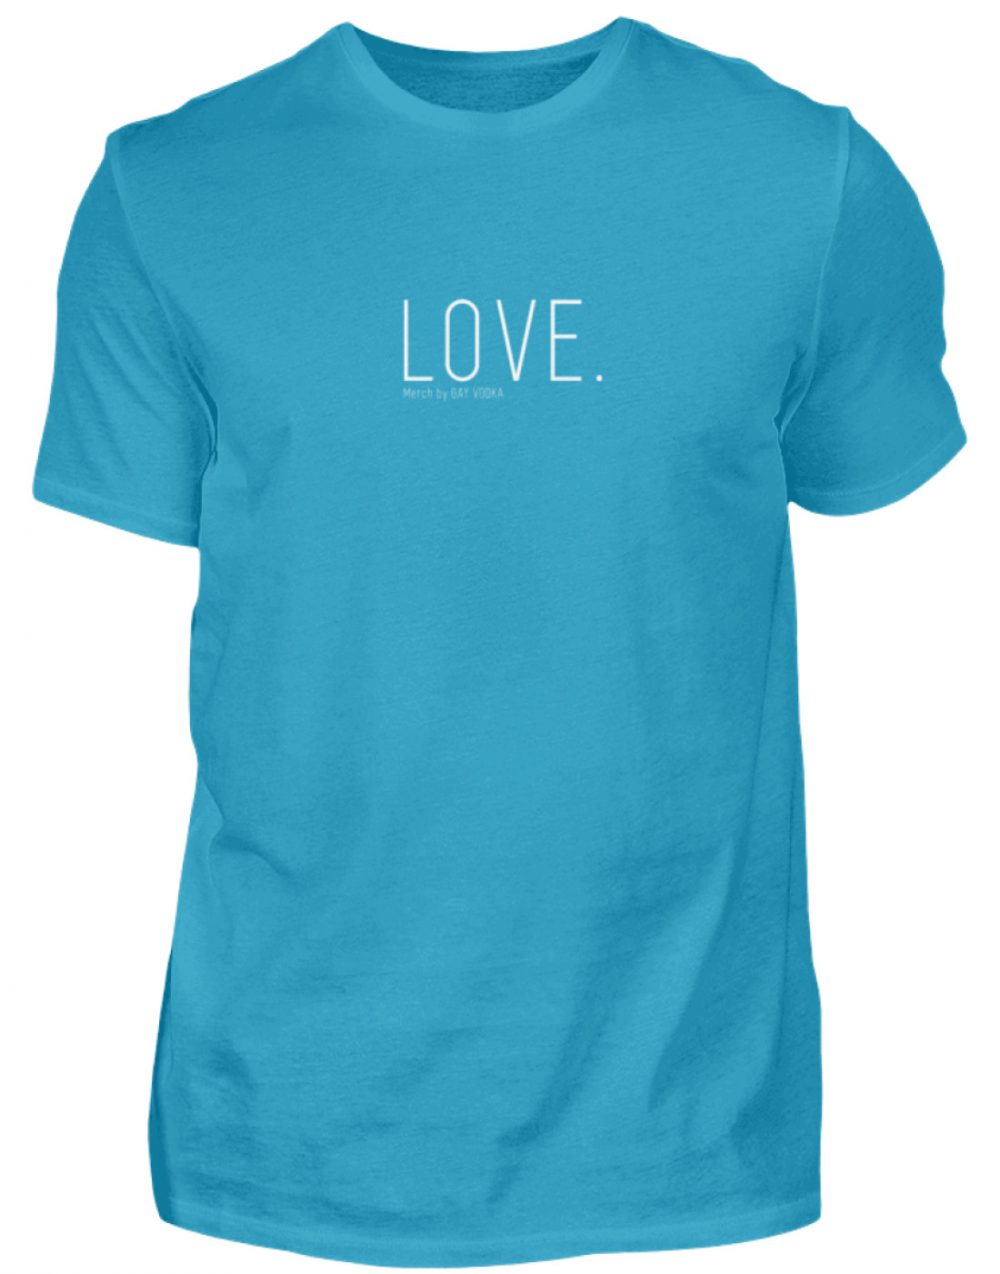 LOVE. - Herren Premiumshirt-3175